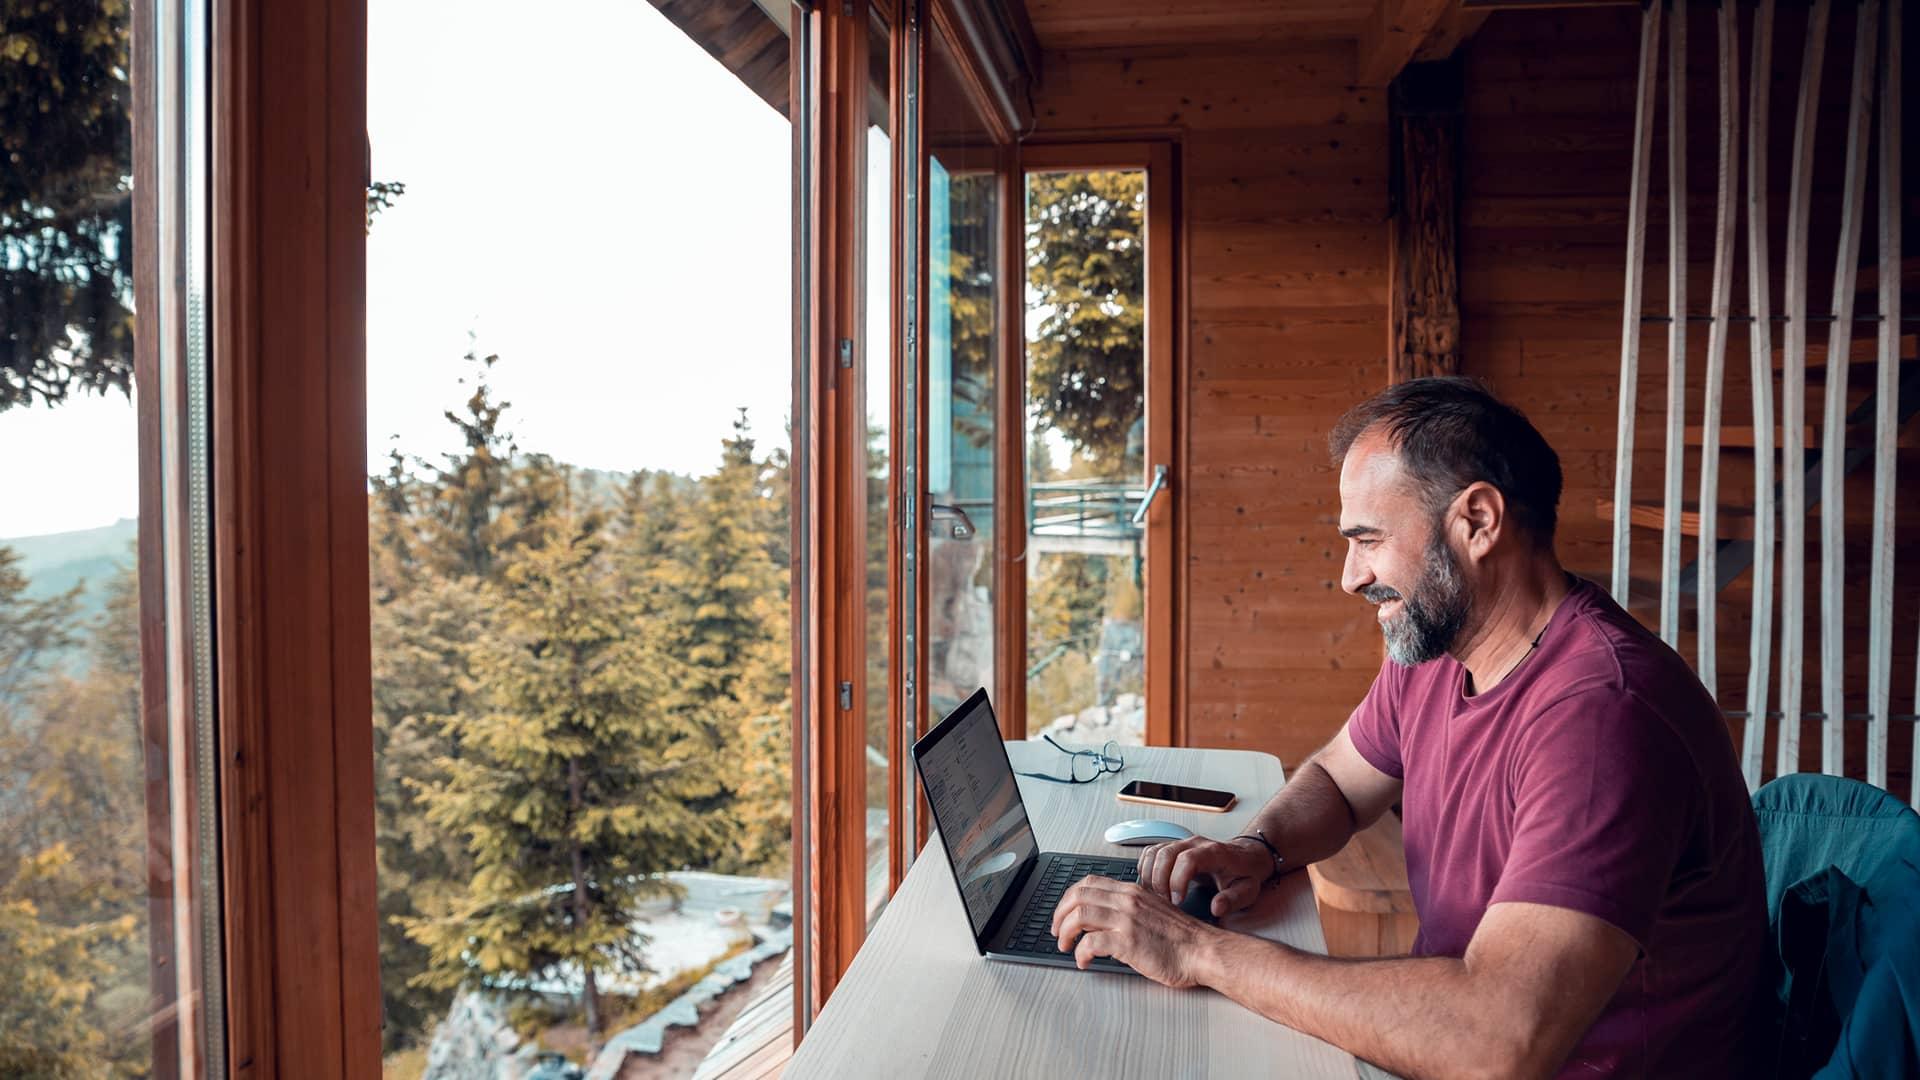 MiFi de Movistar: internet 4G en un router portátil